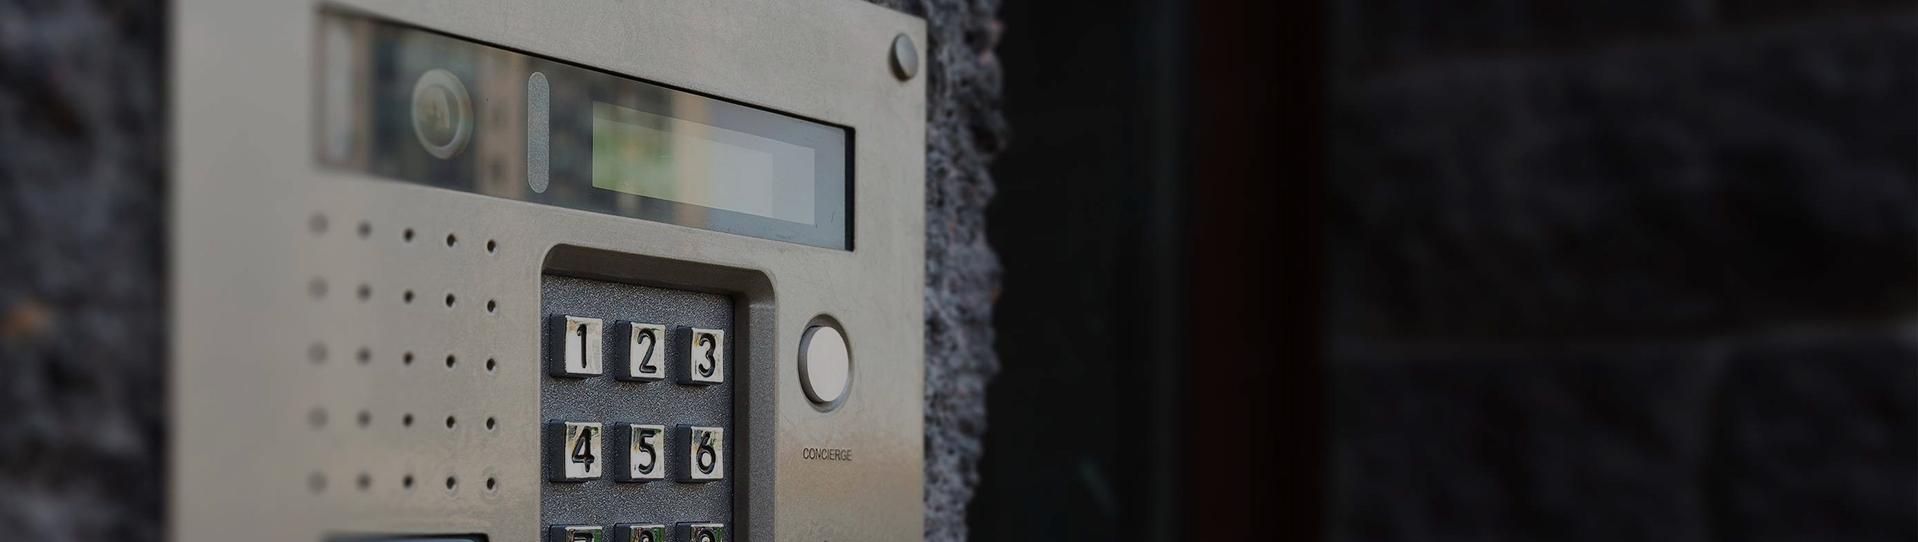 alarm and intercom system on black brick fence